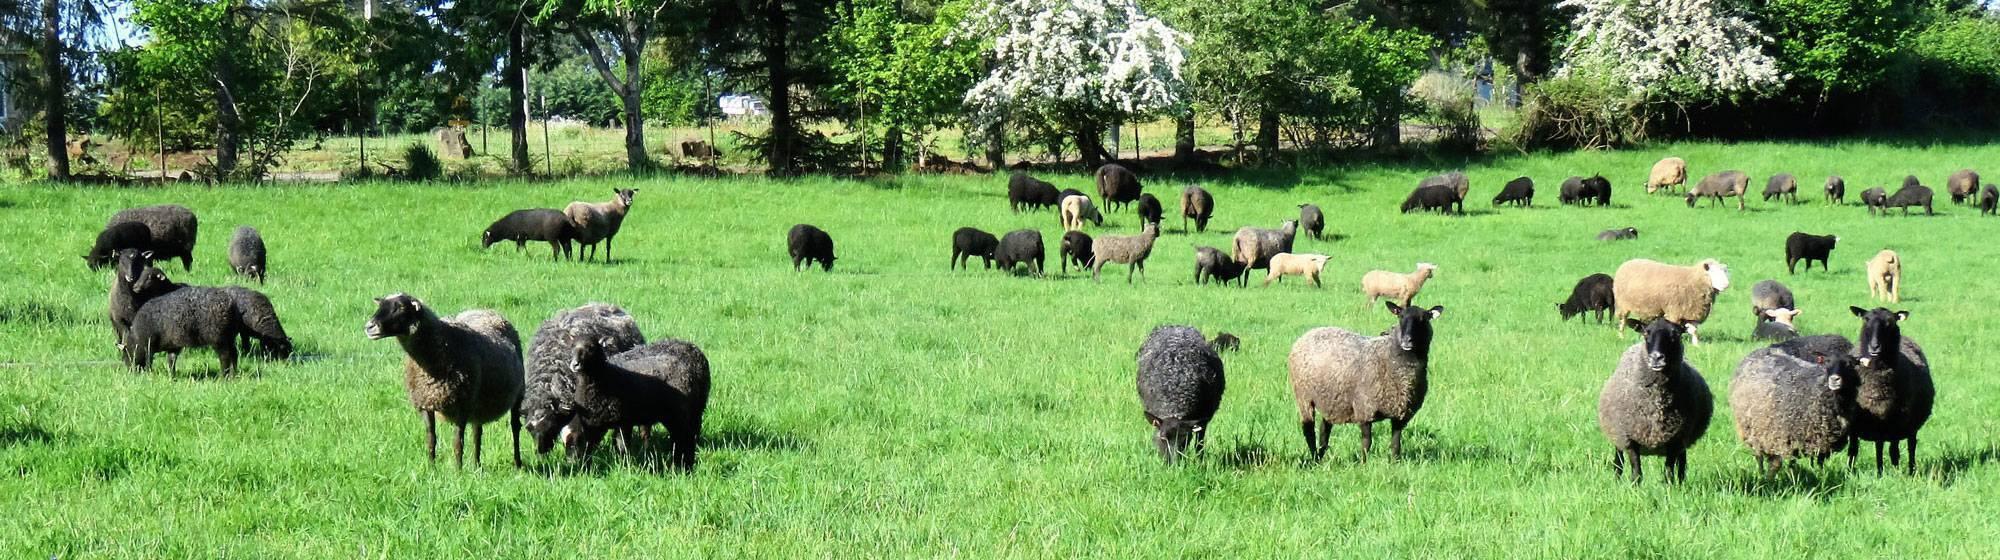 American Gotland Sheep | Upcoming Events